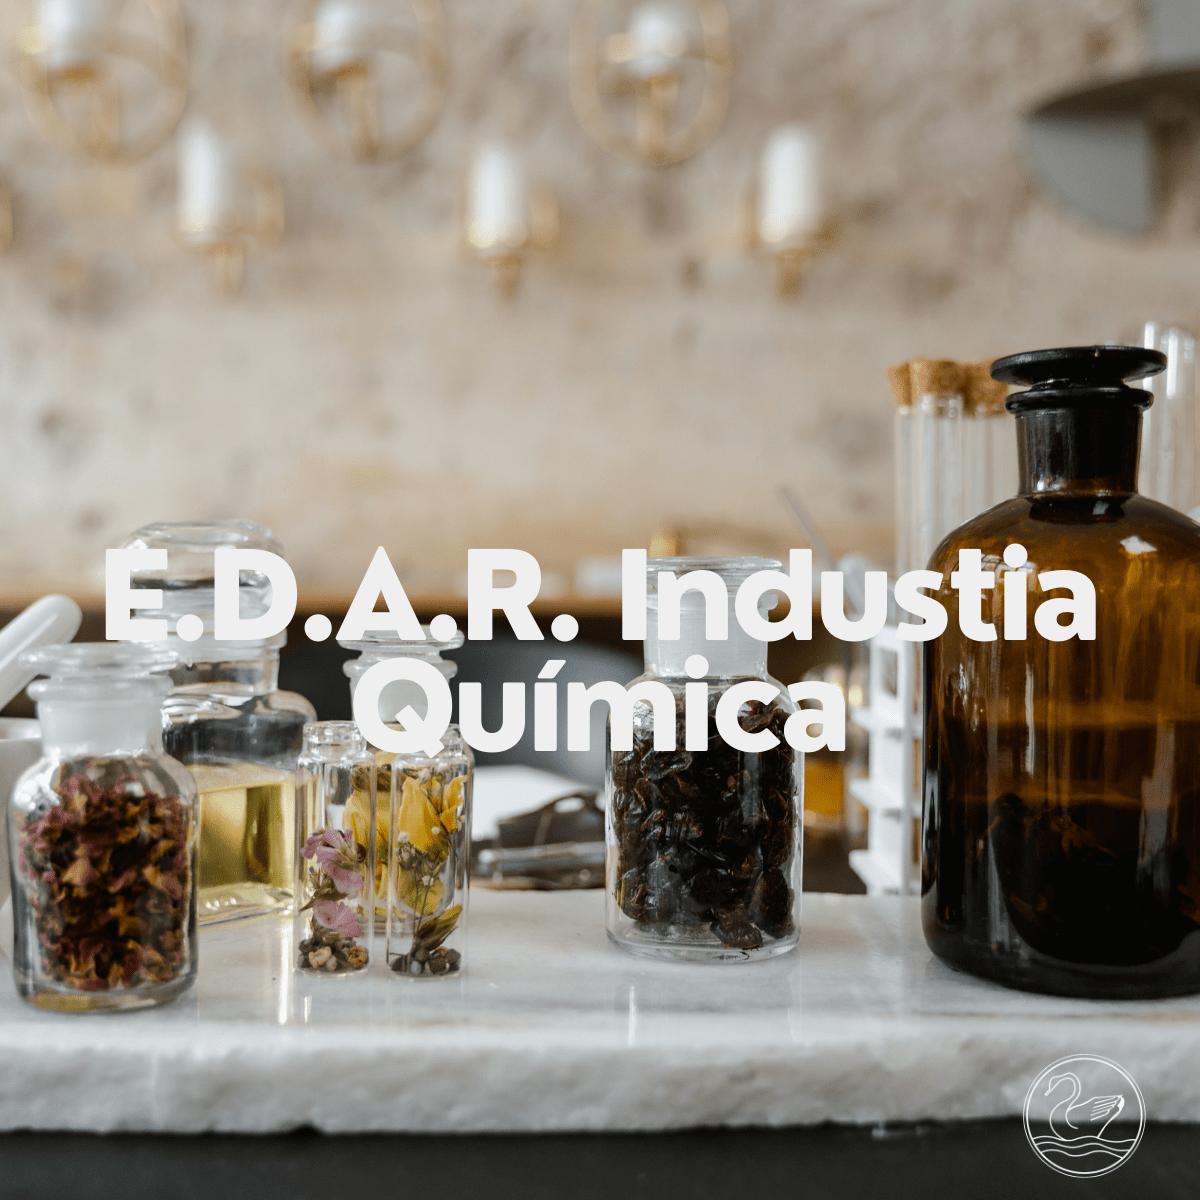 E.D.A.R. Industria Química